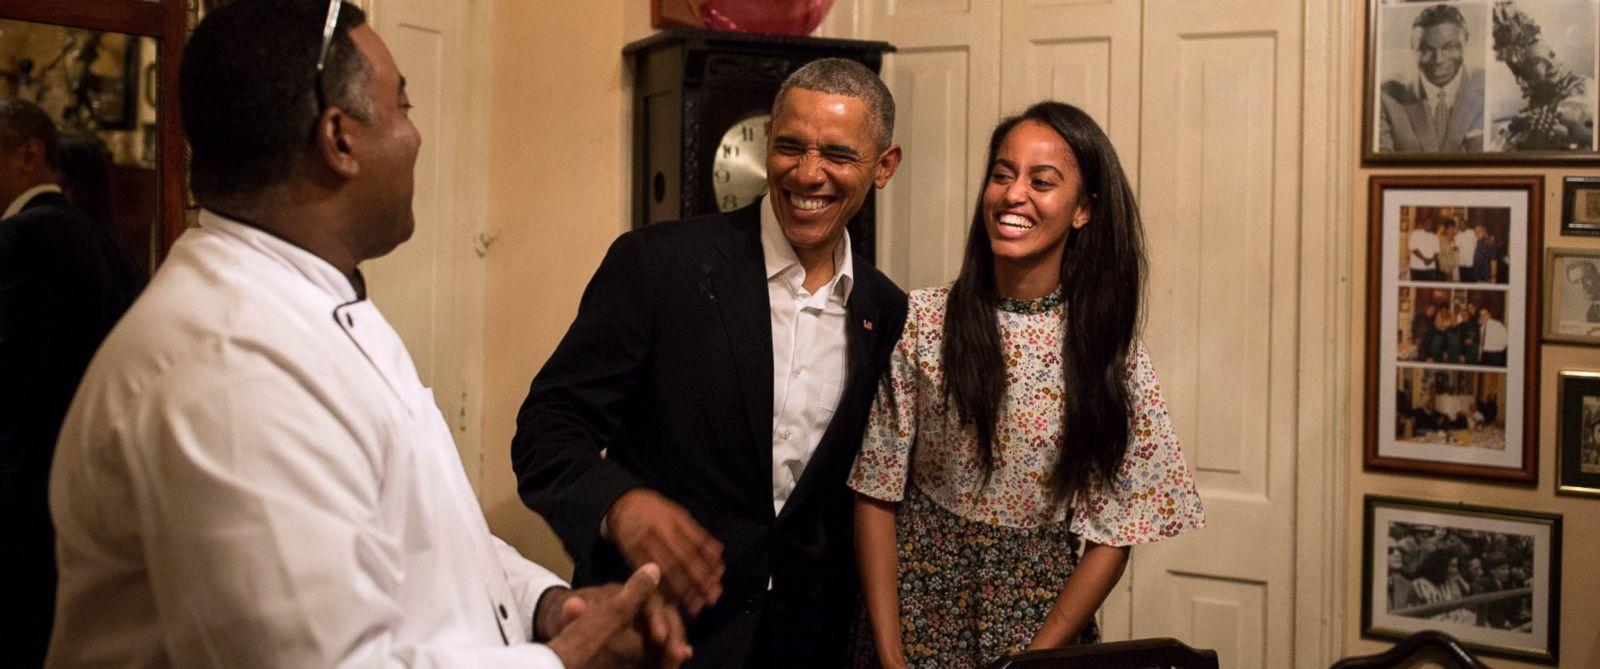 PHOTO: President Barack Obama and daughter Malia share a laugh as Malia interprets in Spanish for a restauranteur in Havana, Cuba, Sunday, March 20, 2016.